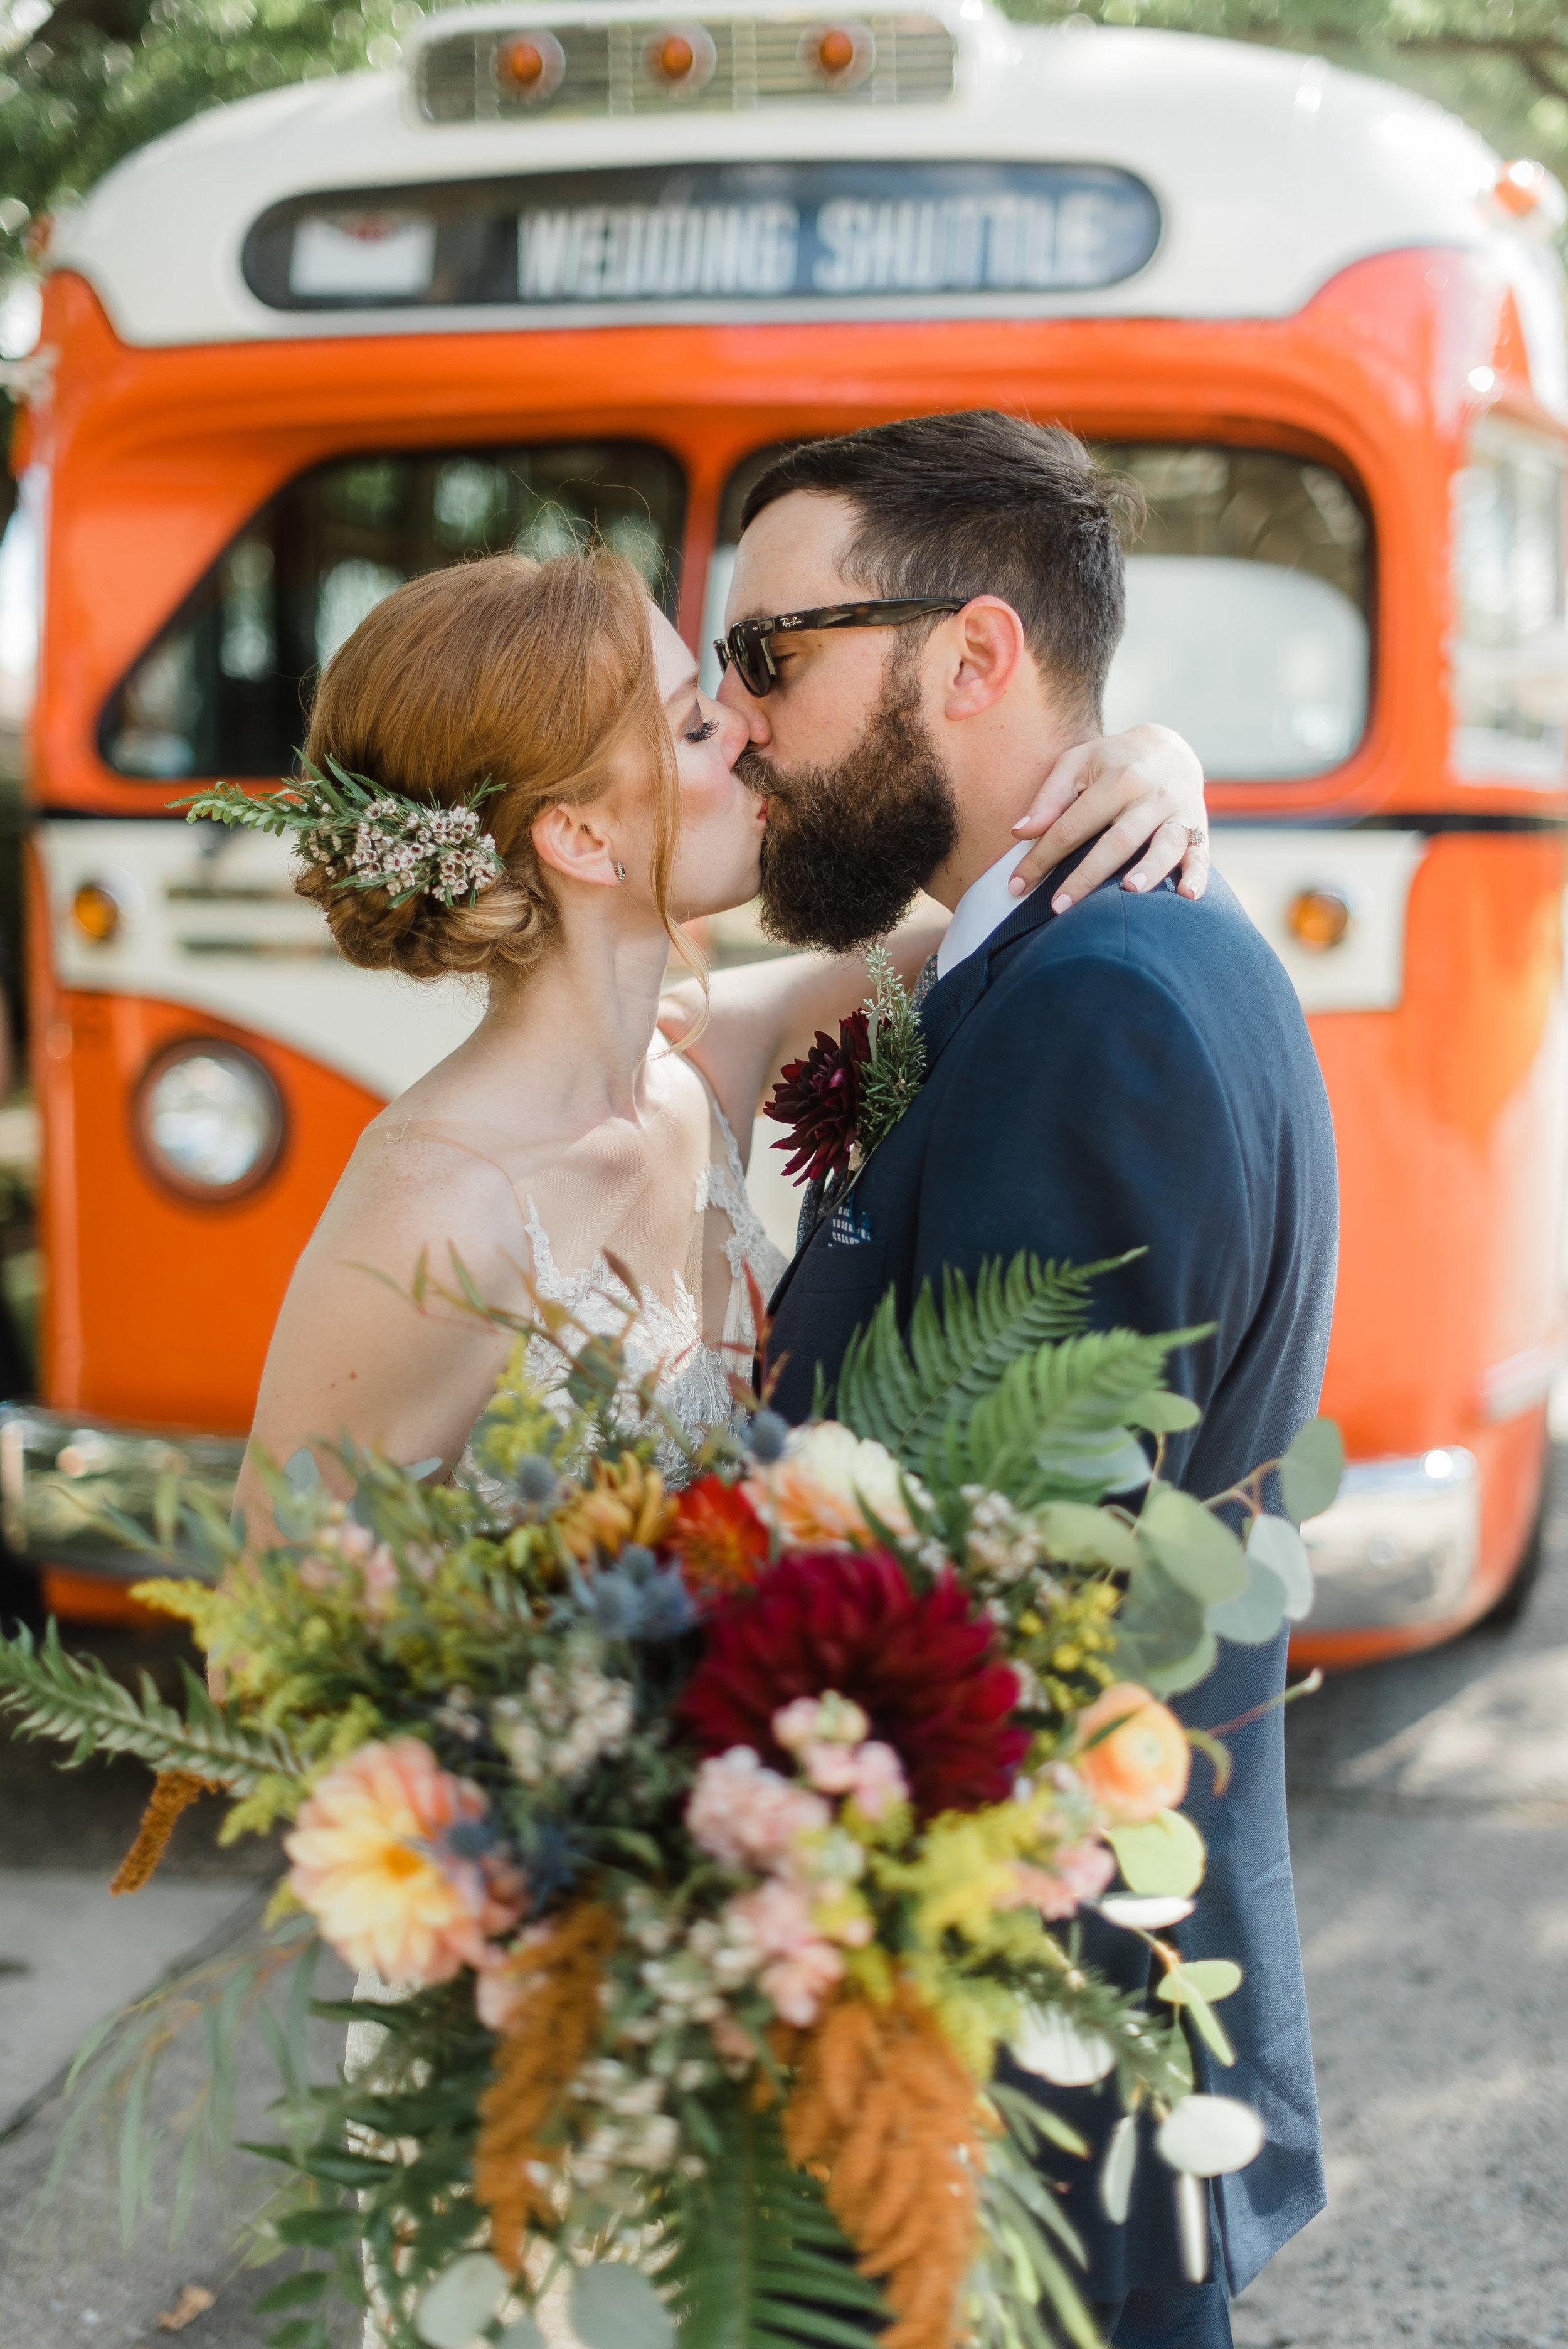 pittsburgh-wedding-photographer-modern-greenery-edgewoodclub-boho0128.jpg